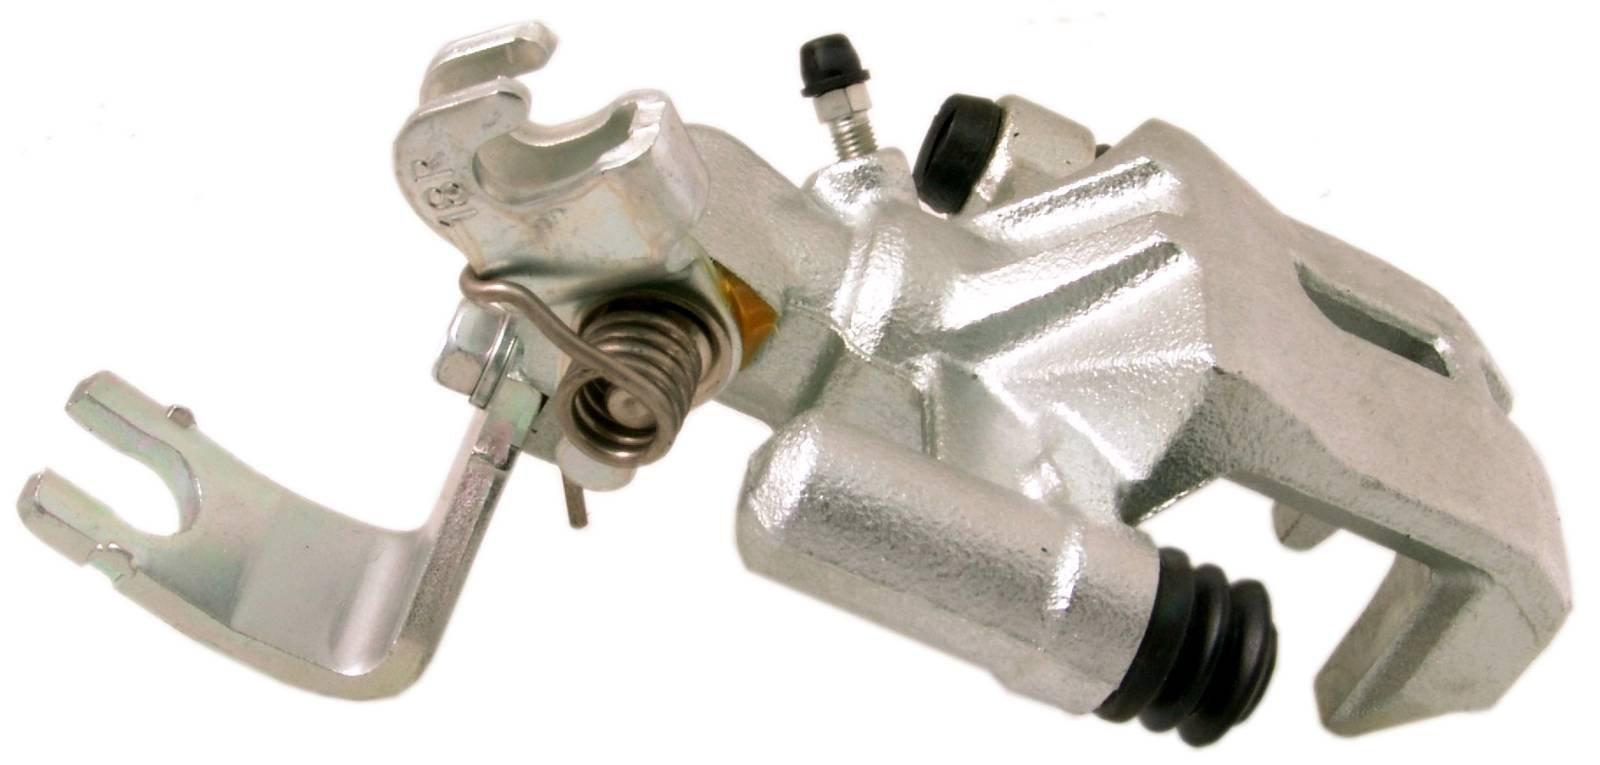 FEBEST 0577-GERR Rear Right Brake Support